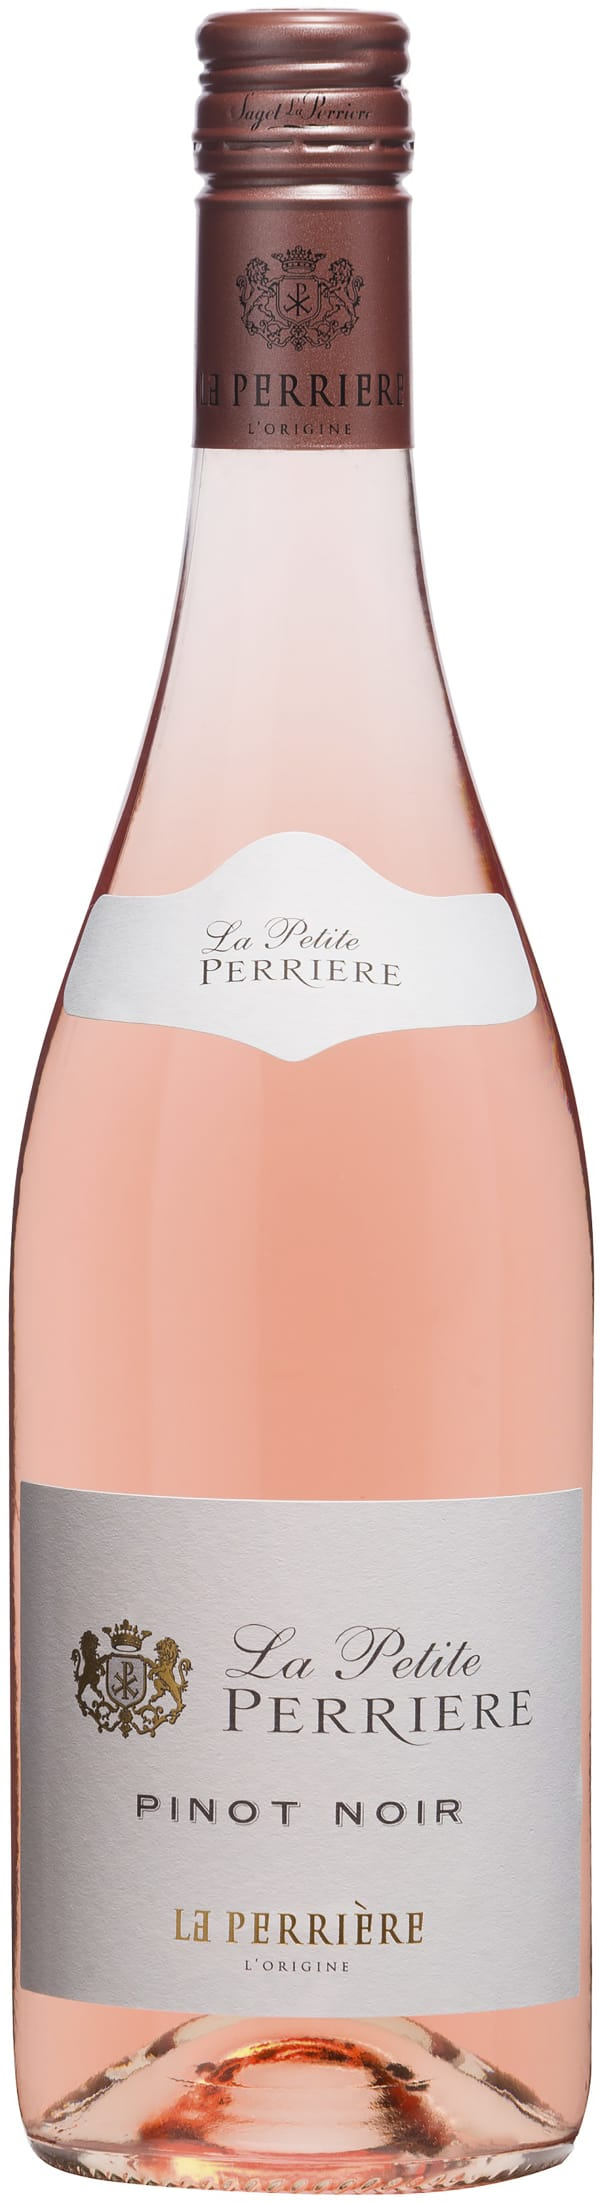 La Petite Perriere Rose Pinot Noir 2019